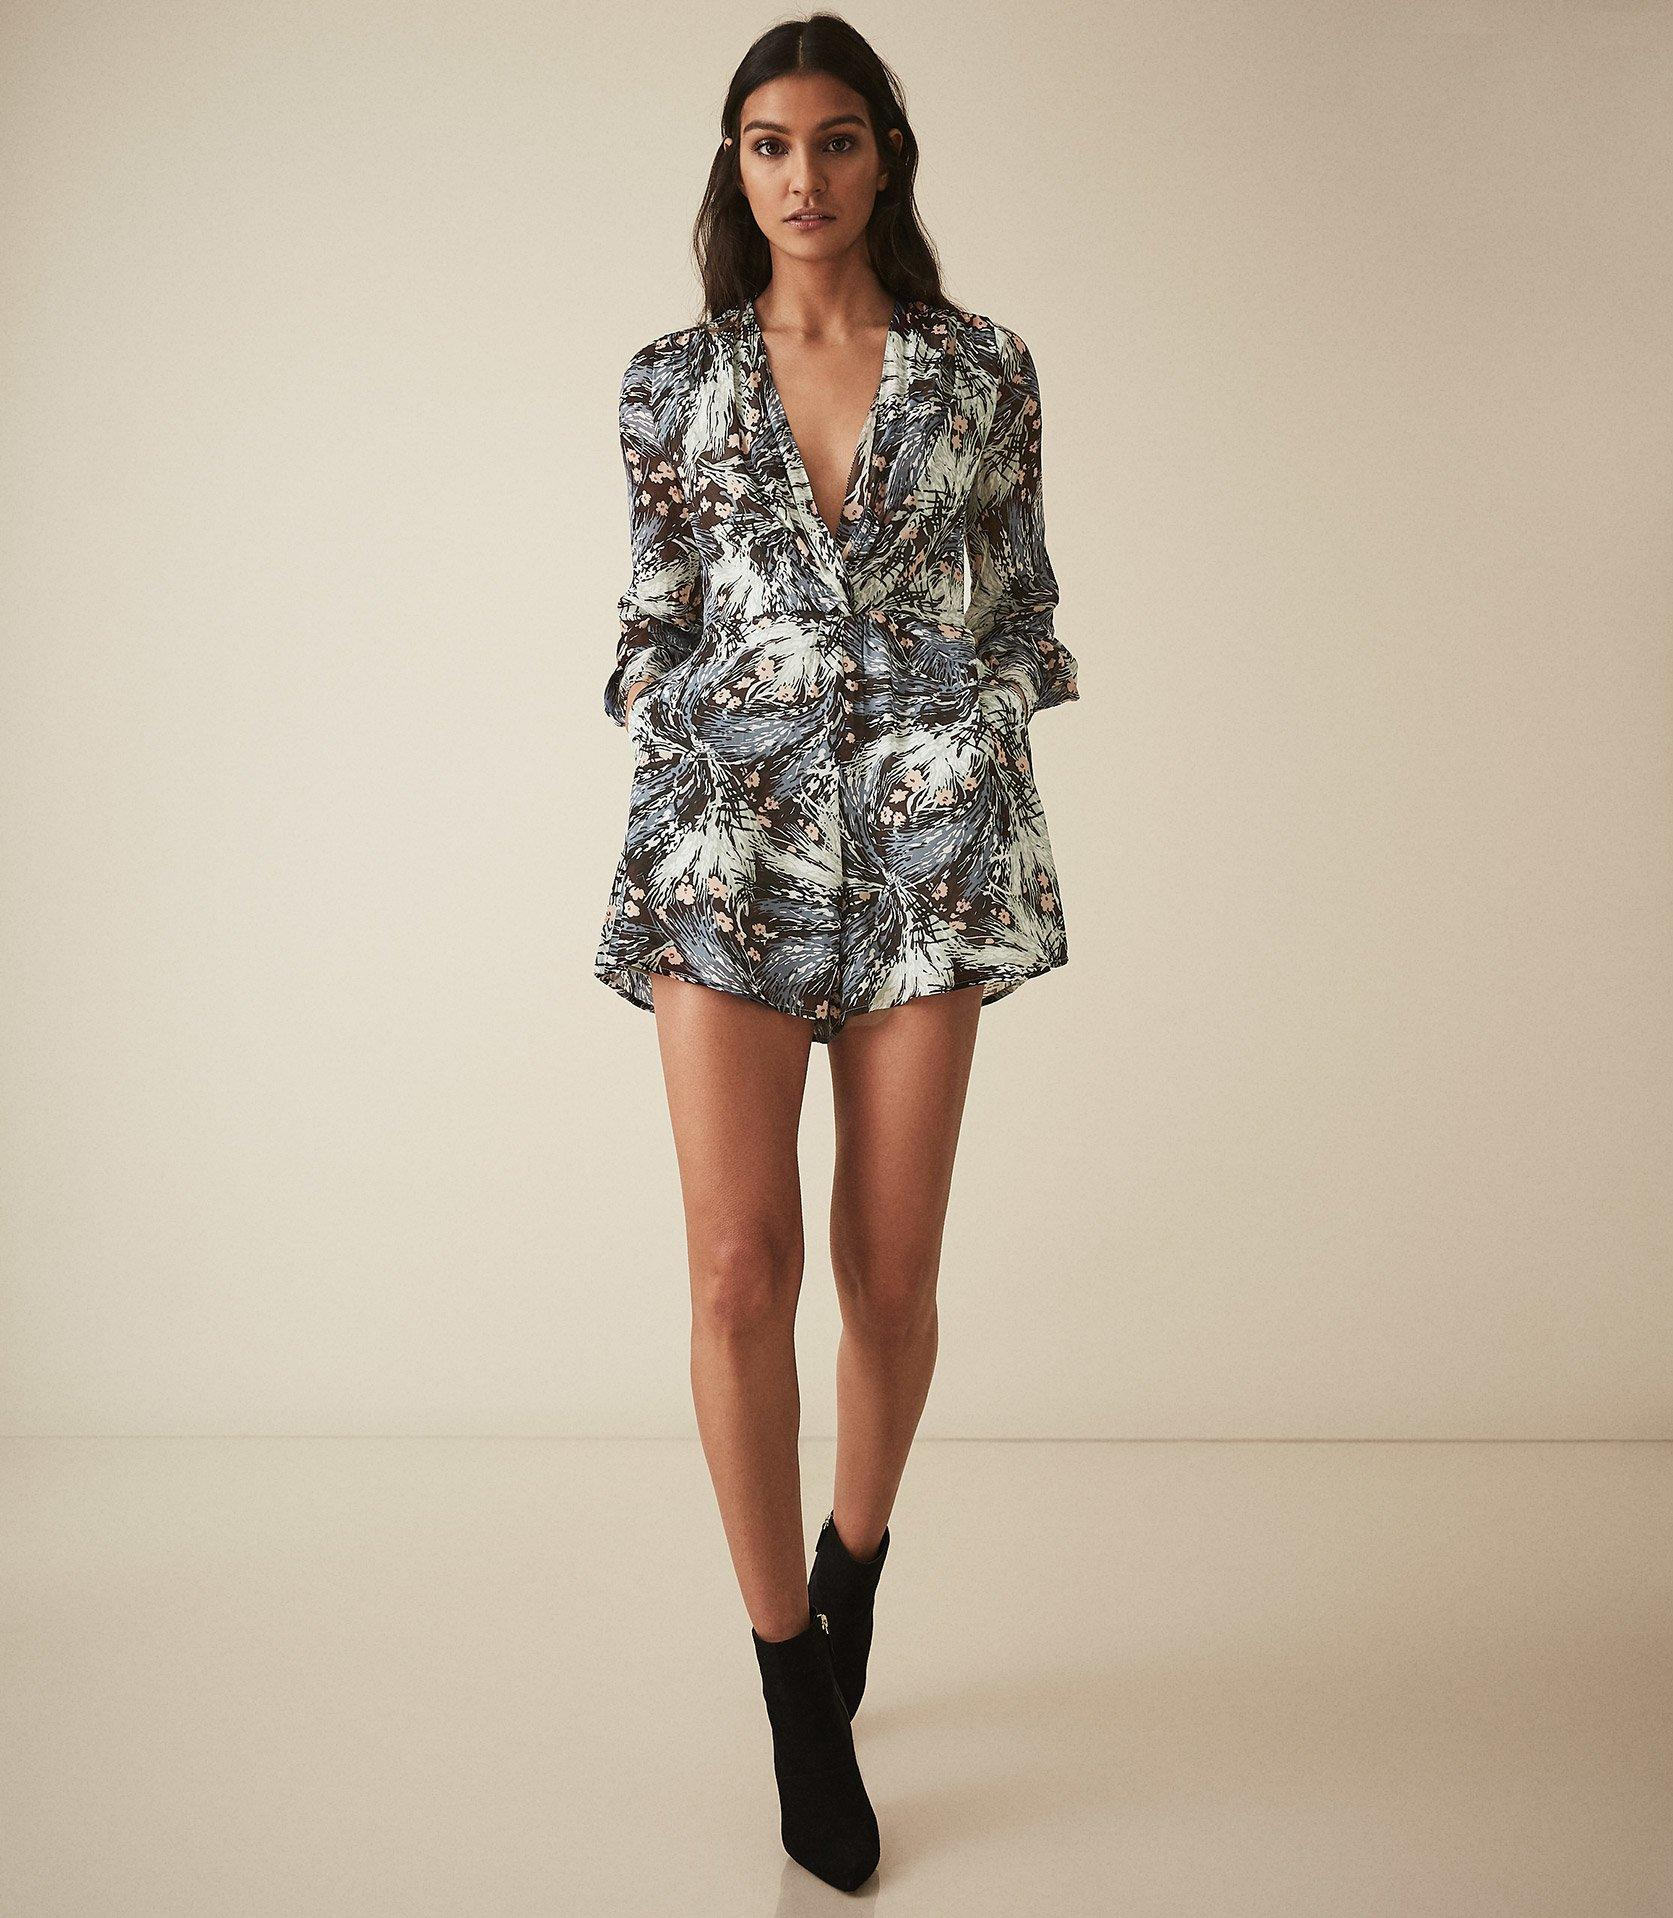 480553e4d8c Reiss Alena - Grass Printed Jumpsuit in Black - Lyst